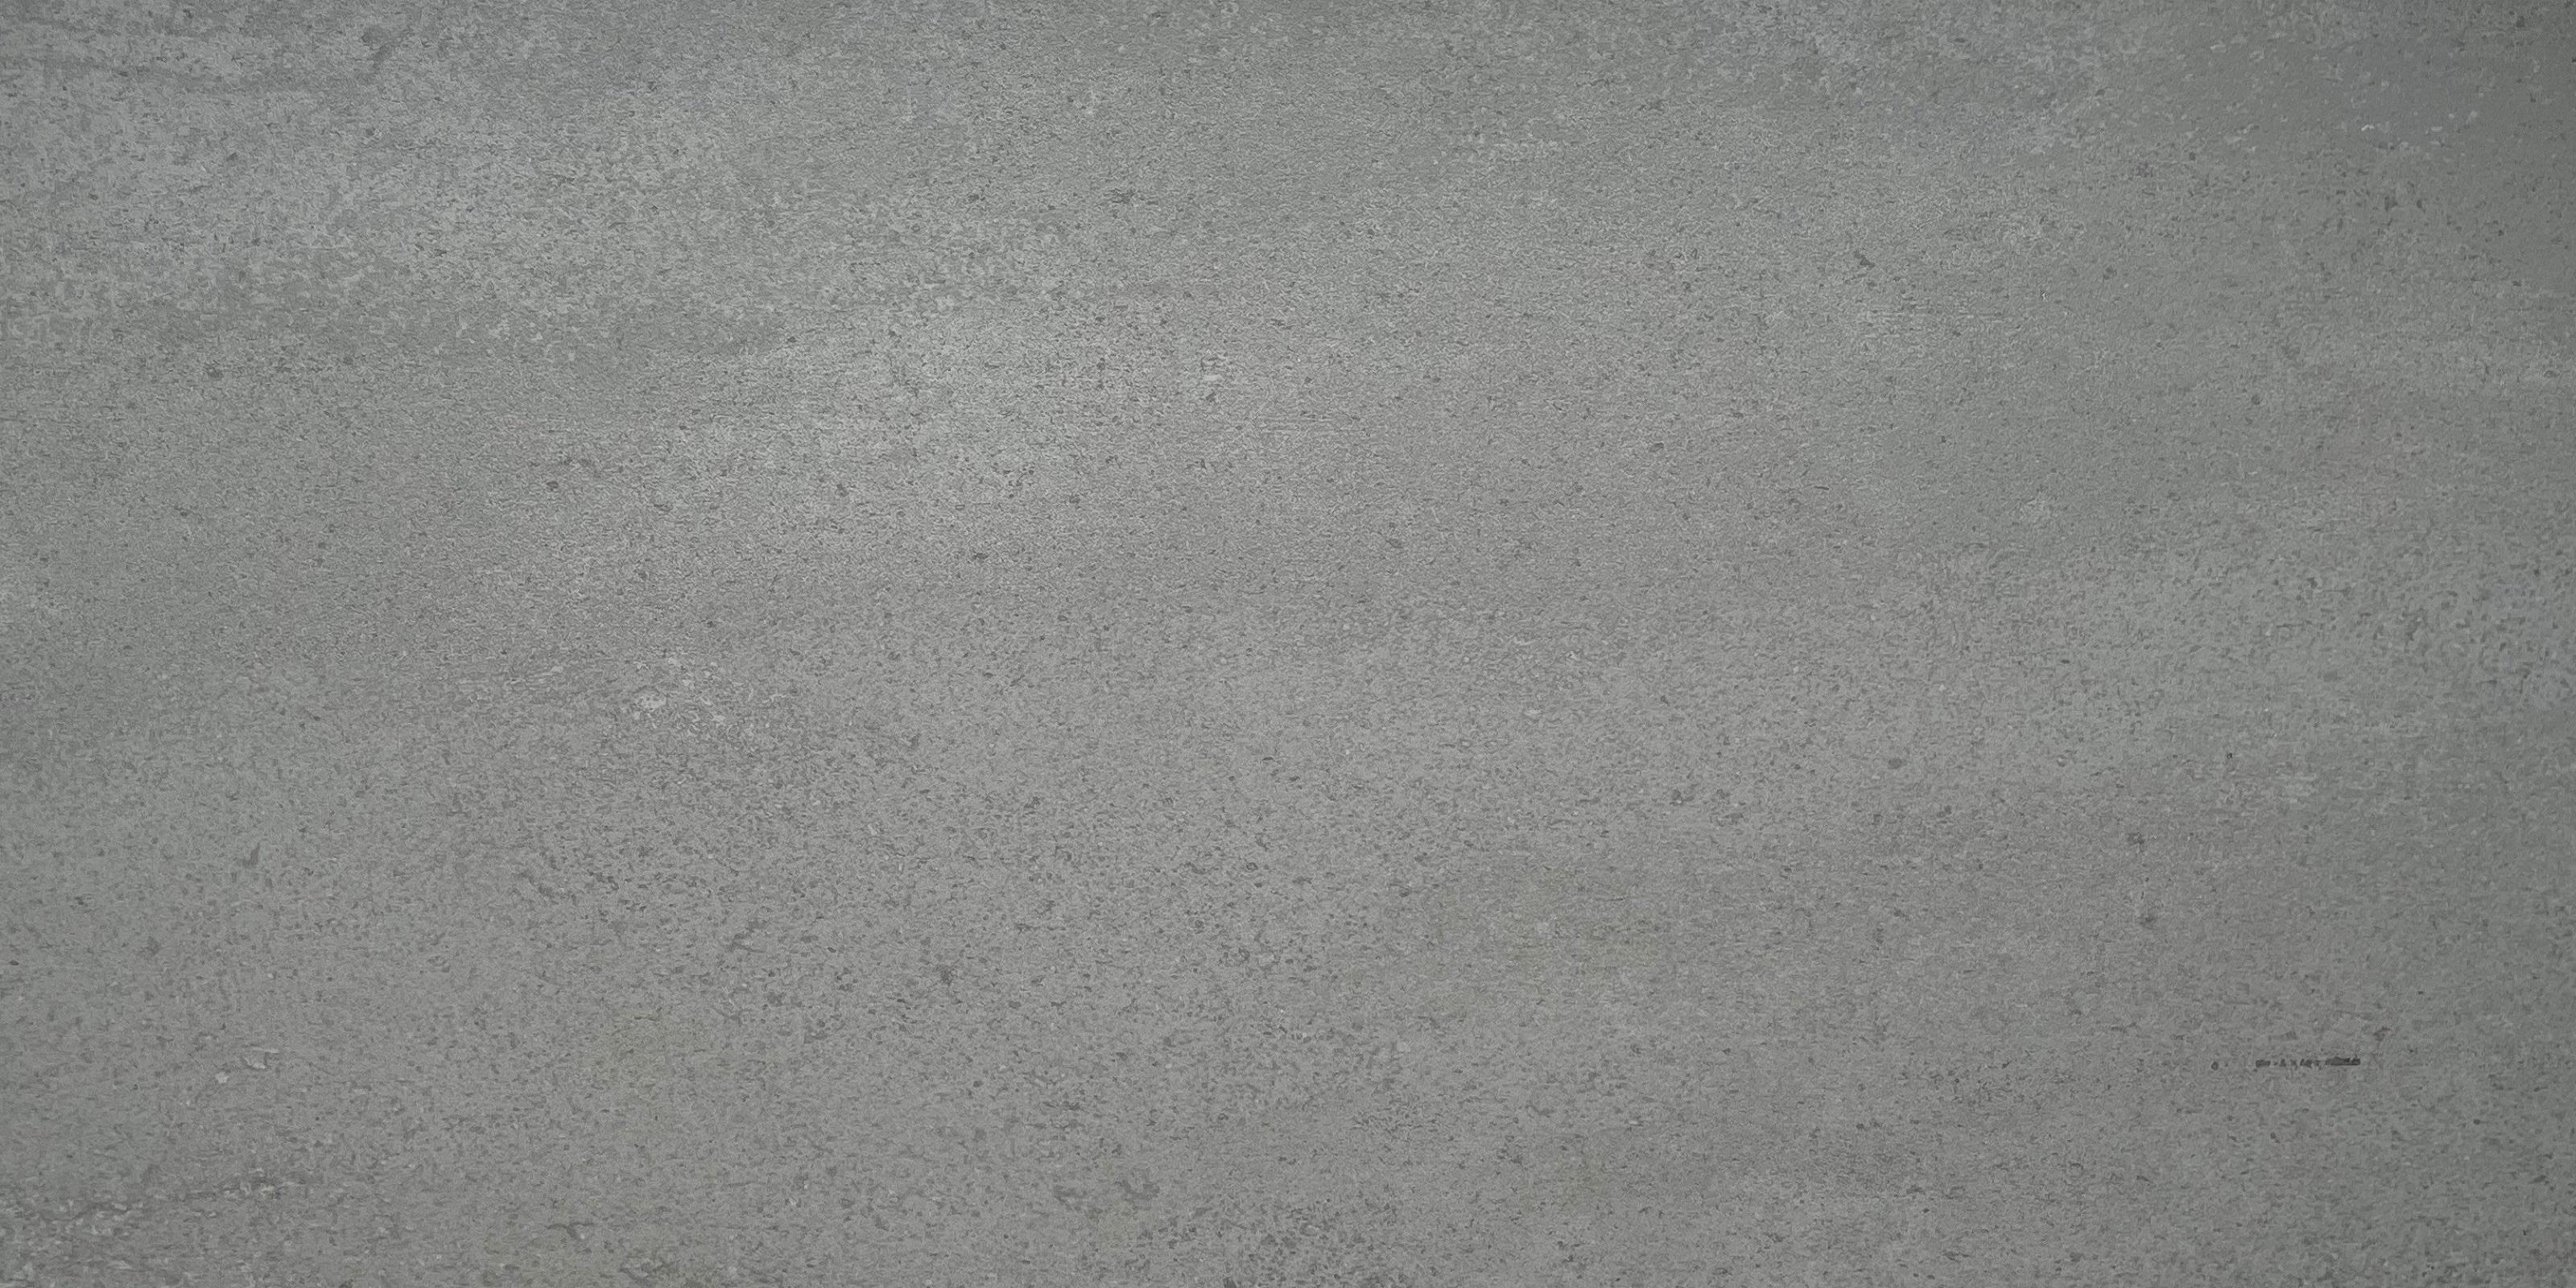 Interb. BRAVA kalib. Grau 30x60cm Bodenfliese R10